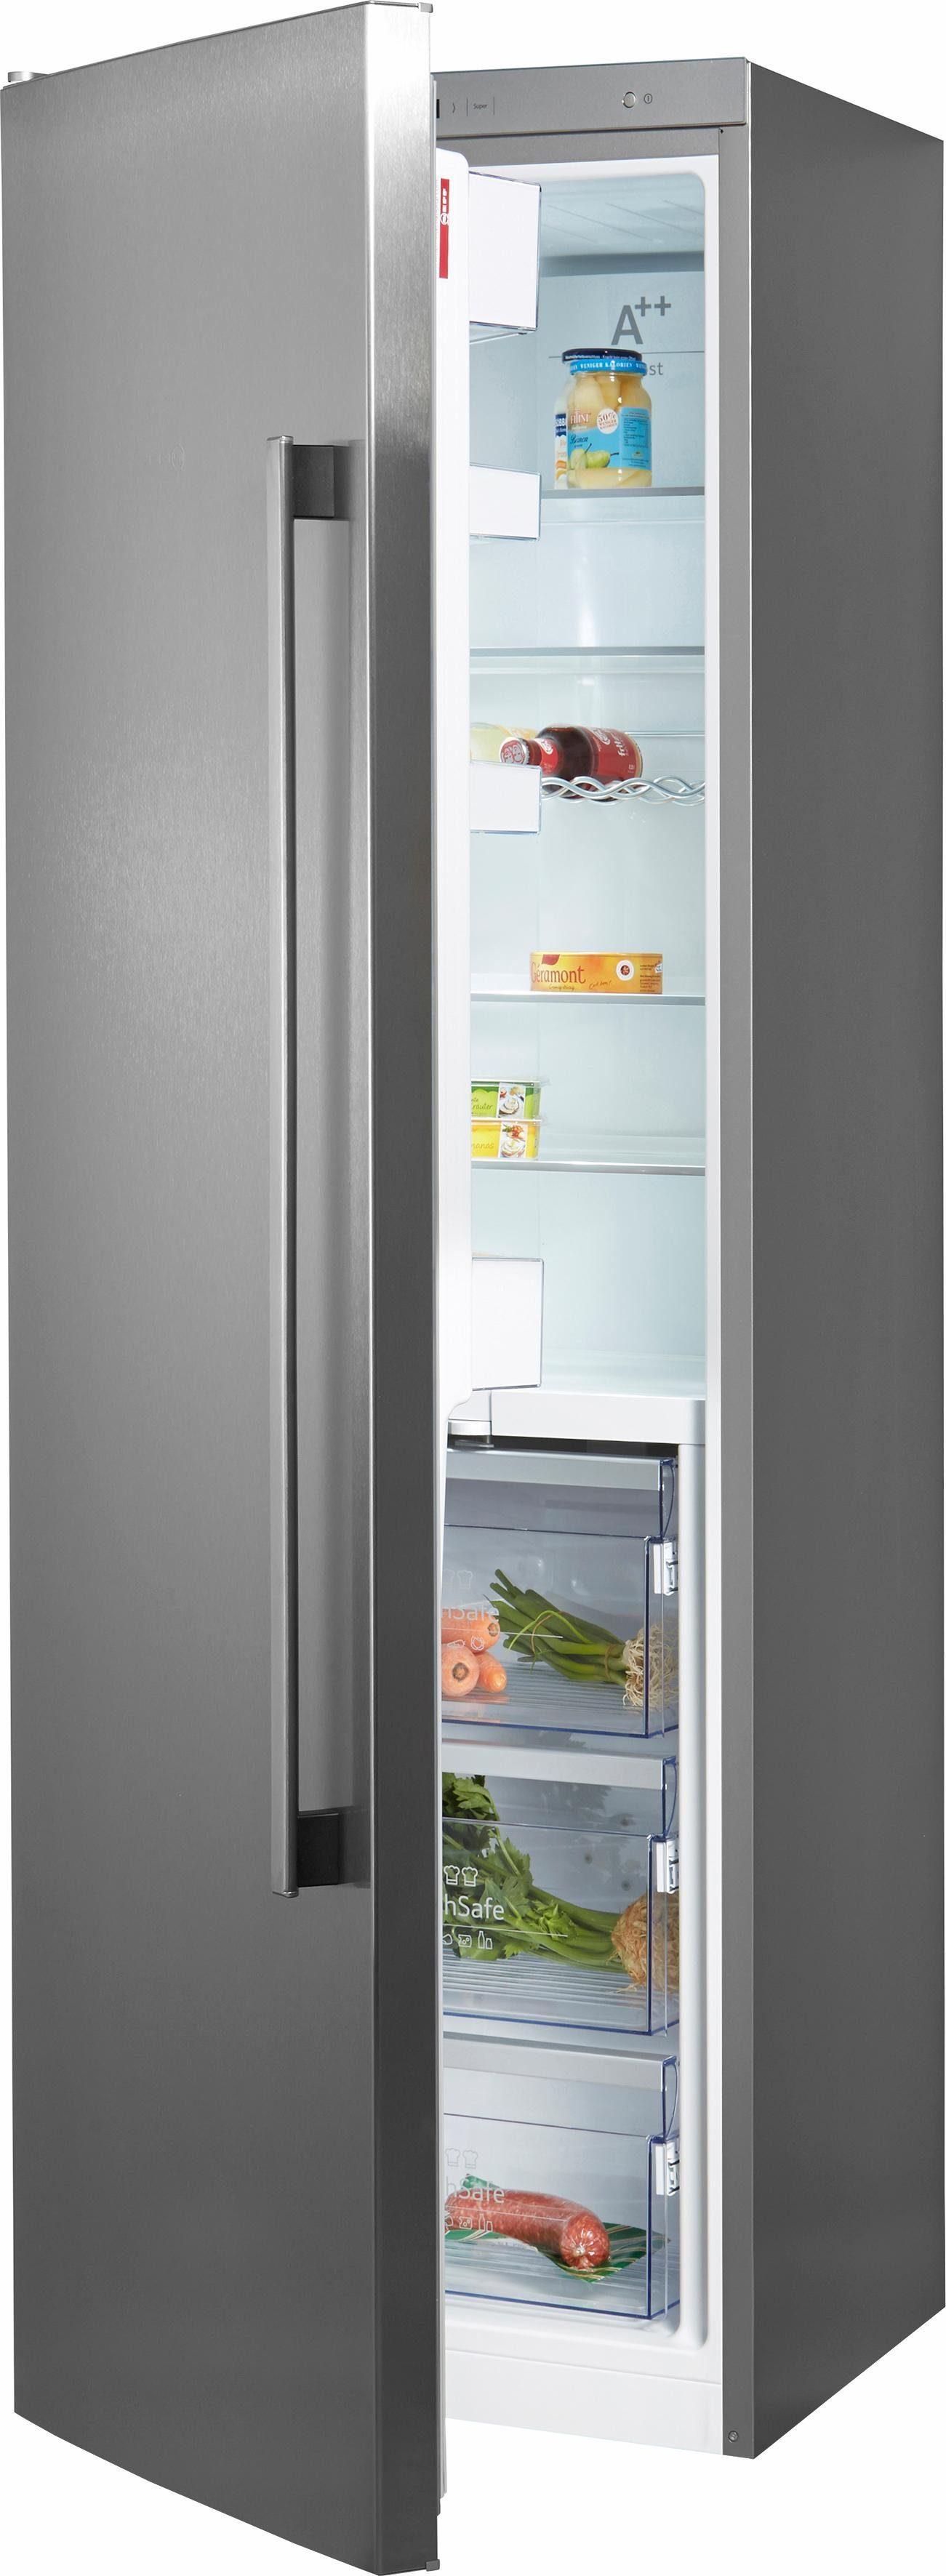 Neff Stand Kühlschrank KSN 858 A2 / KS8348I30, A++, 186 cm